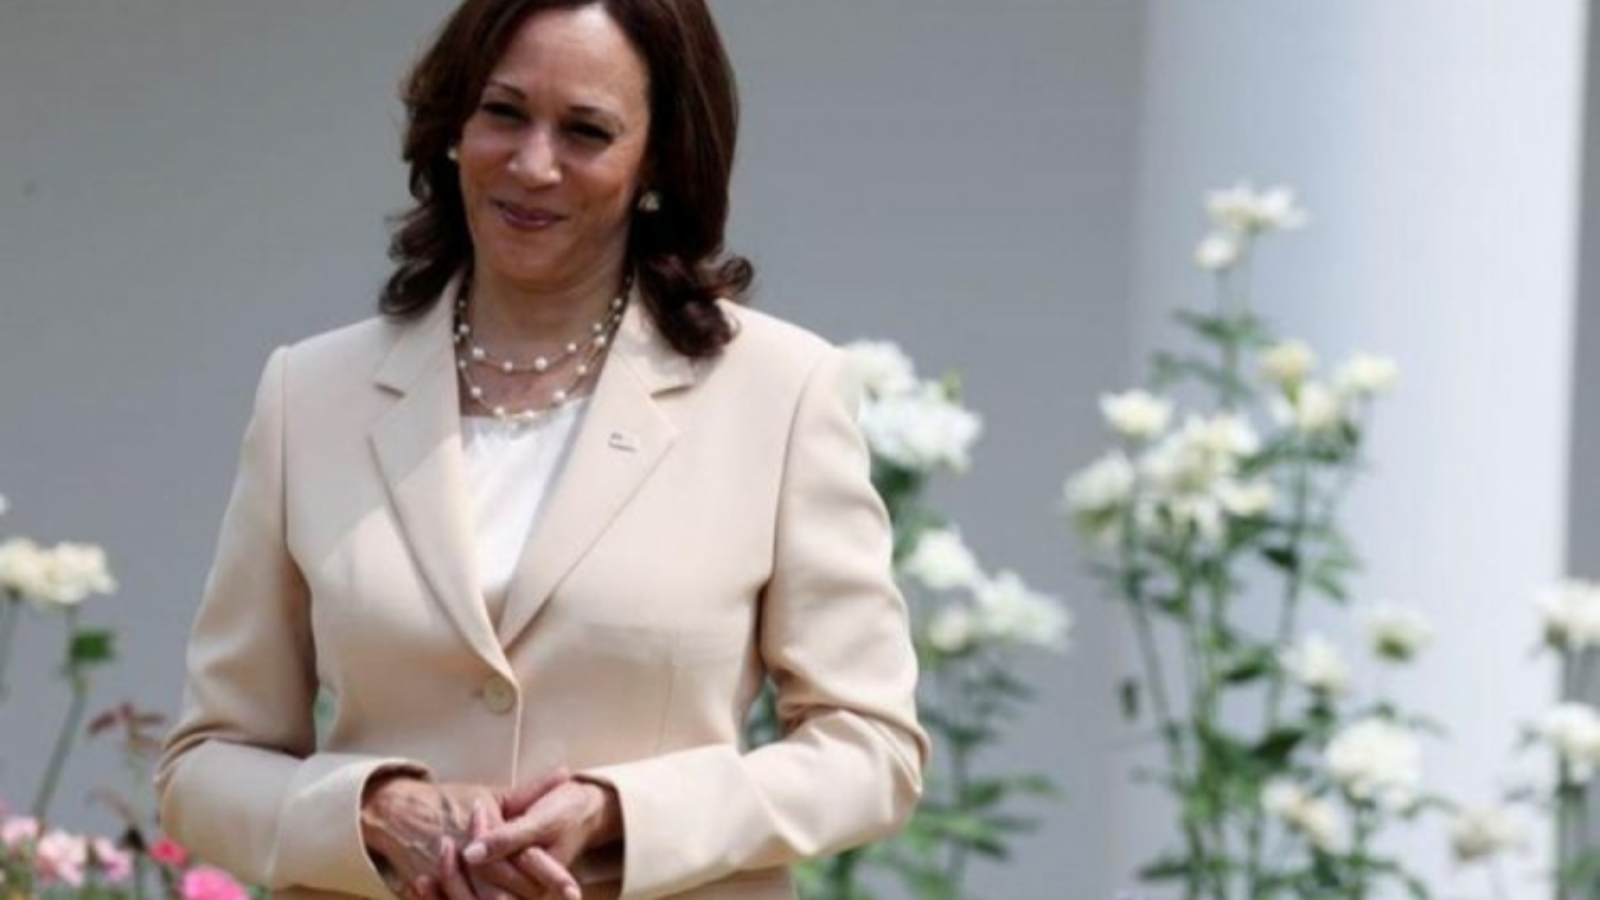 US Vice President due to visit Vietnam next month